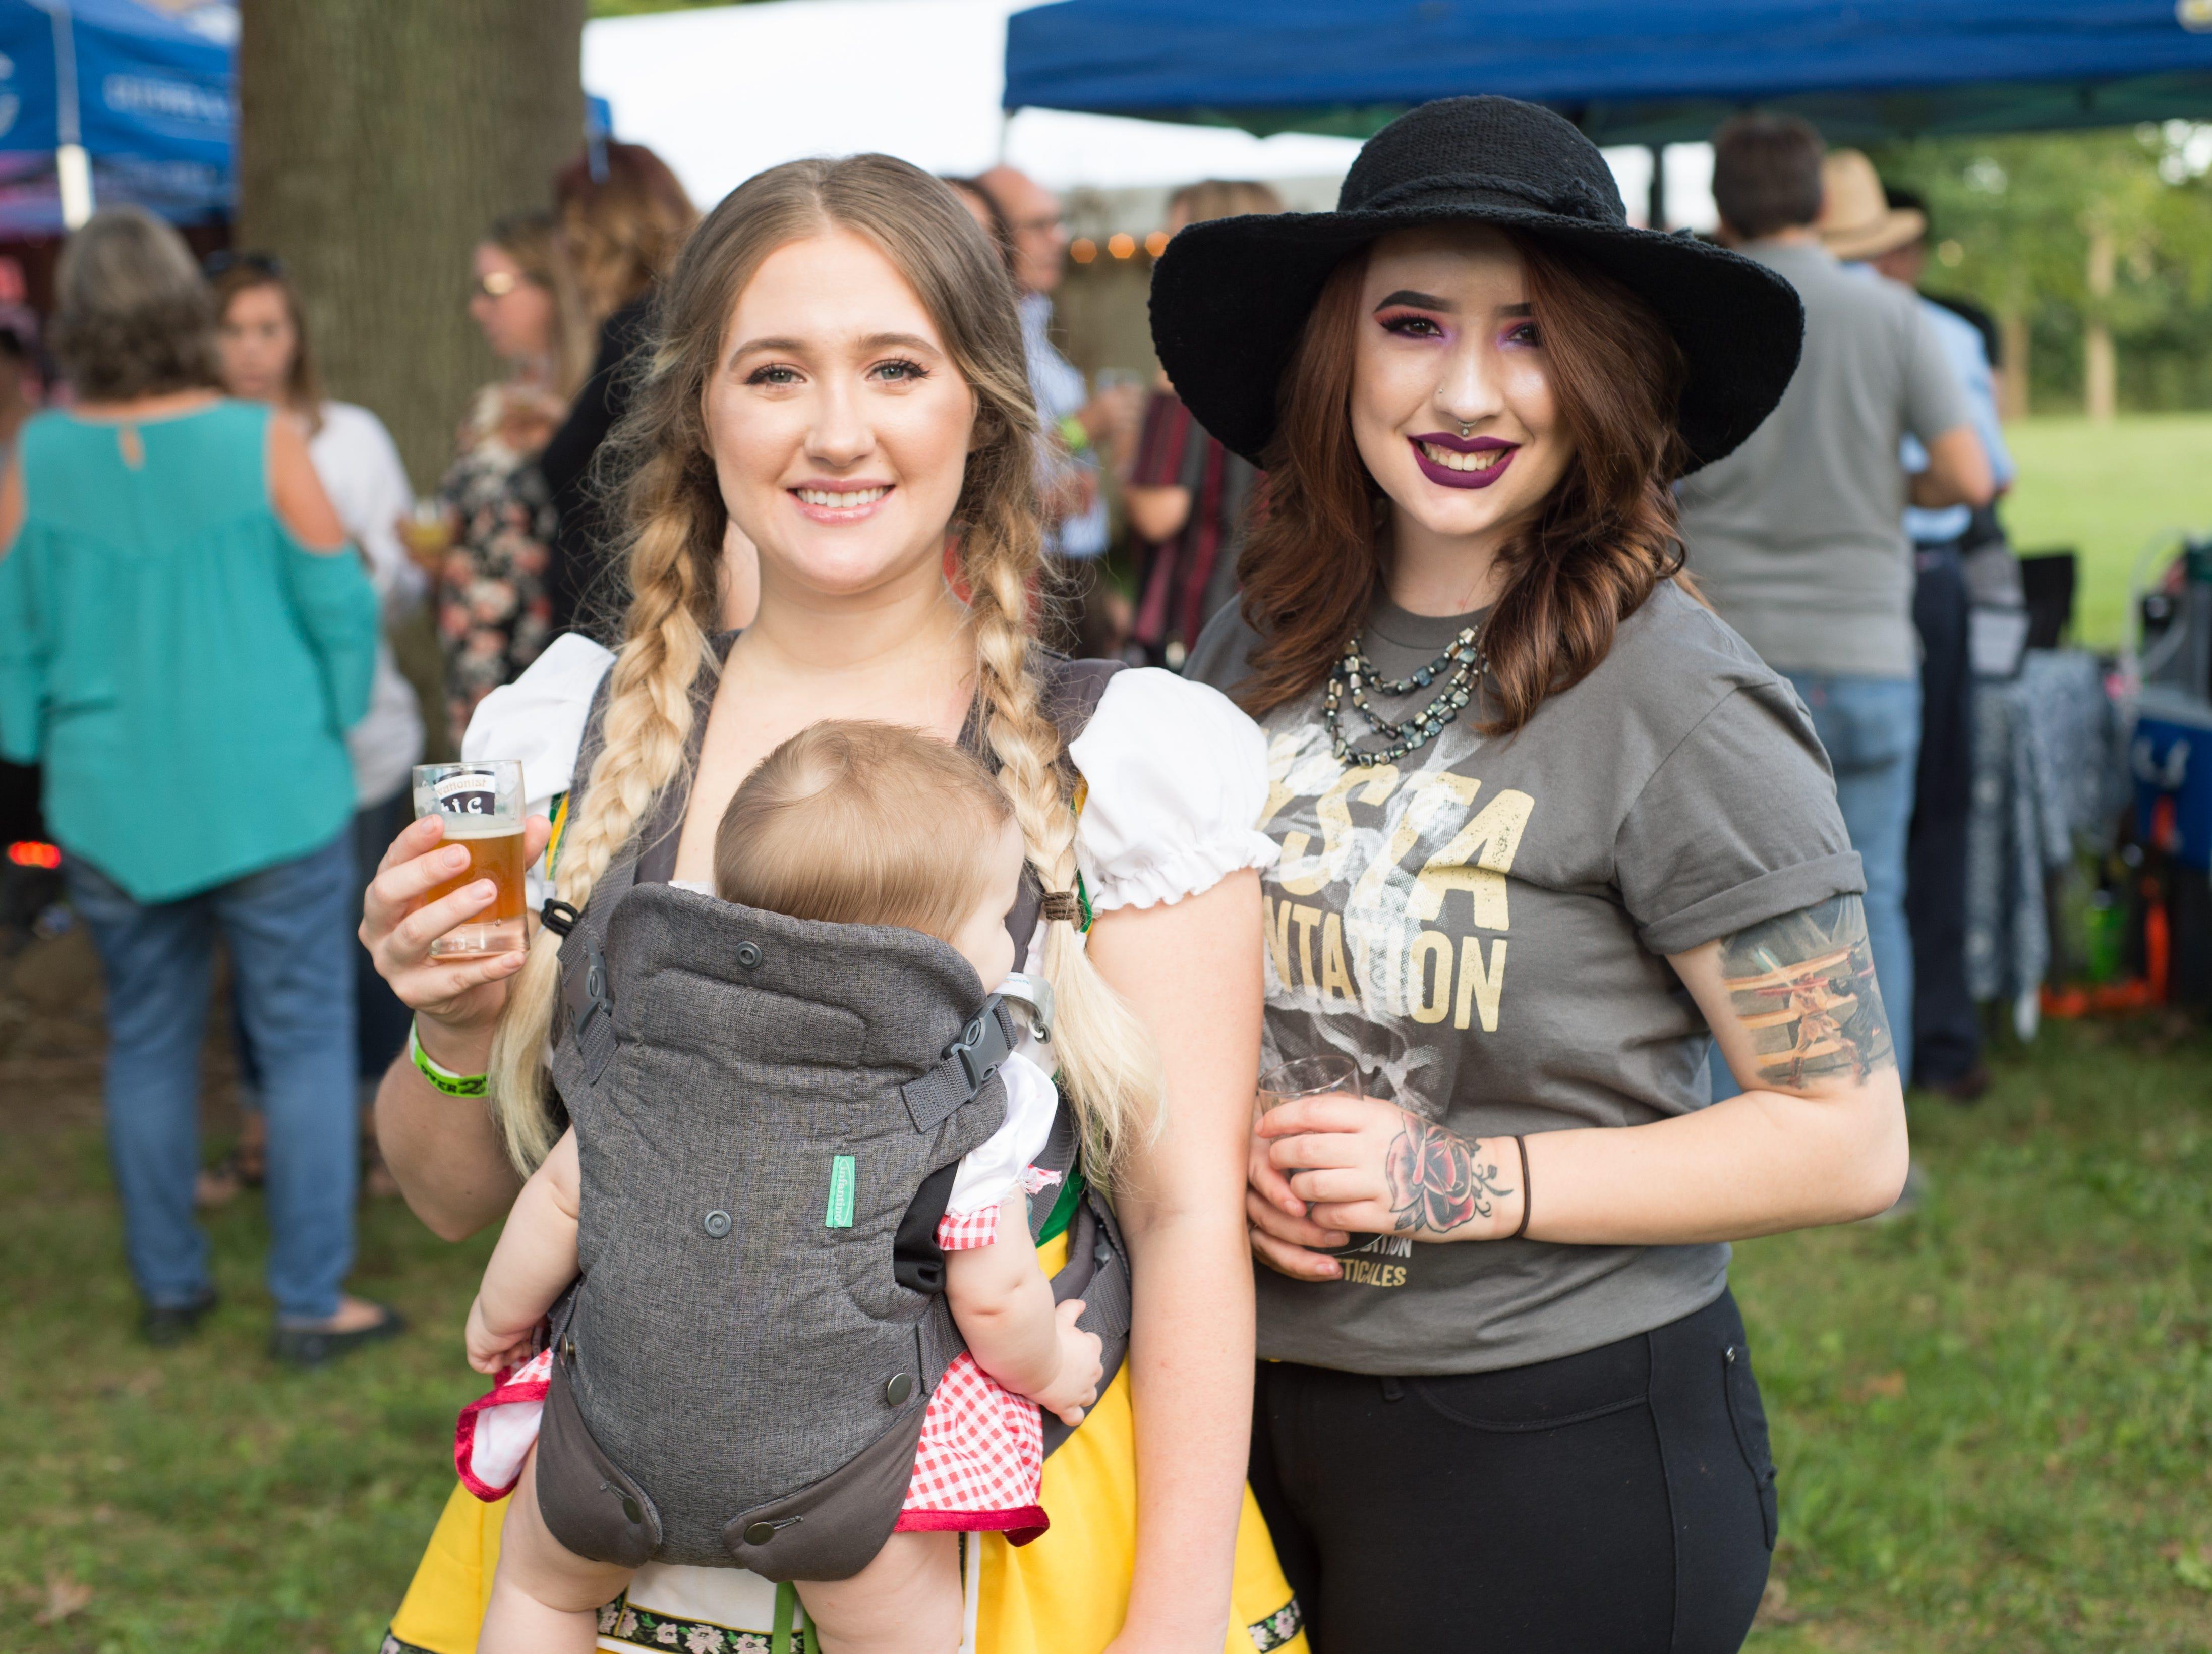 Hennessey Seitz with Ella and Brianna Hasz enjoy Oktoberfest at Oaklands Mansion in Murfreesboro on Saturday, Sept. 29.